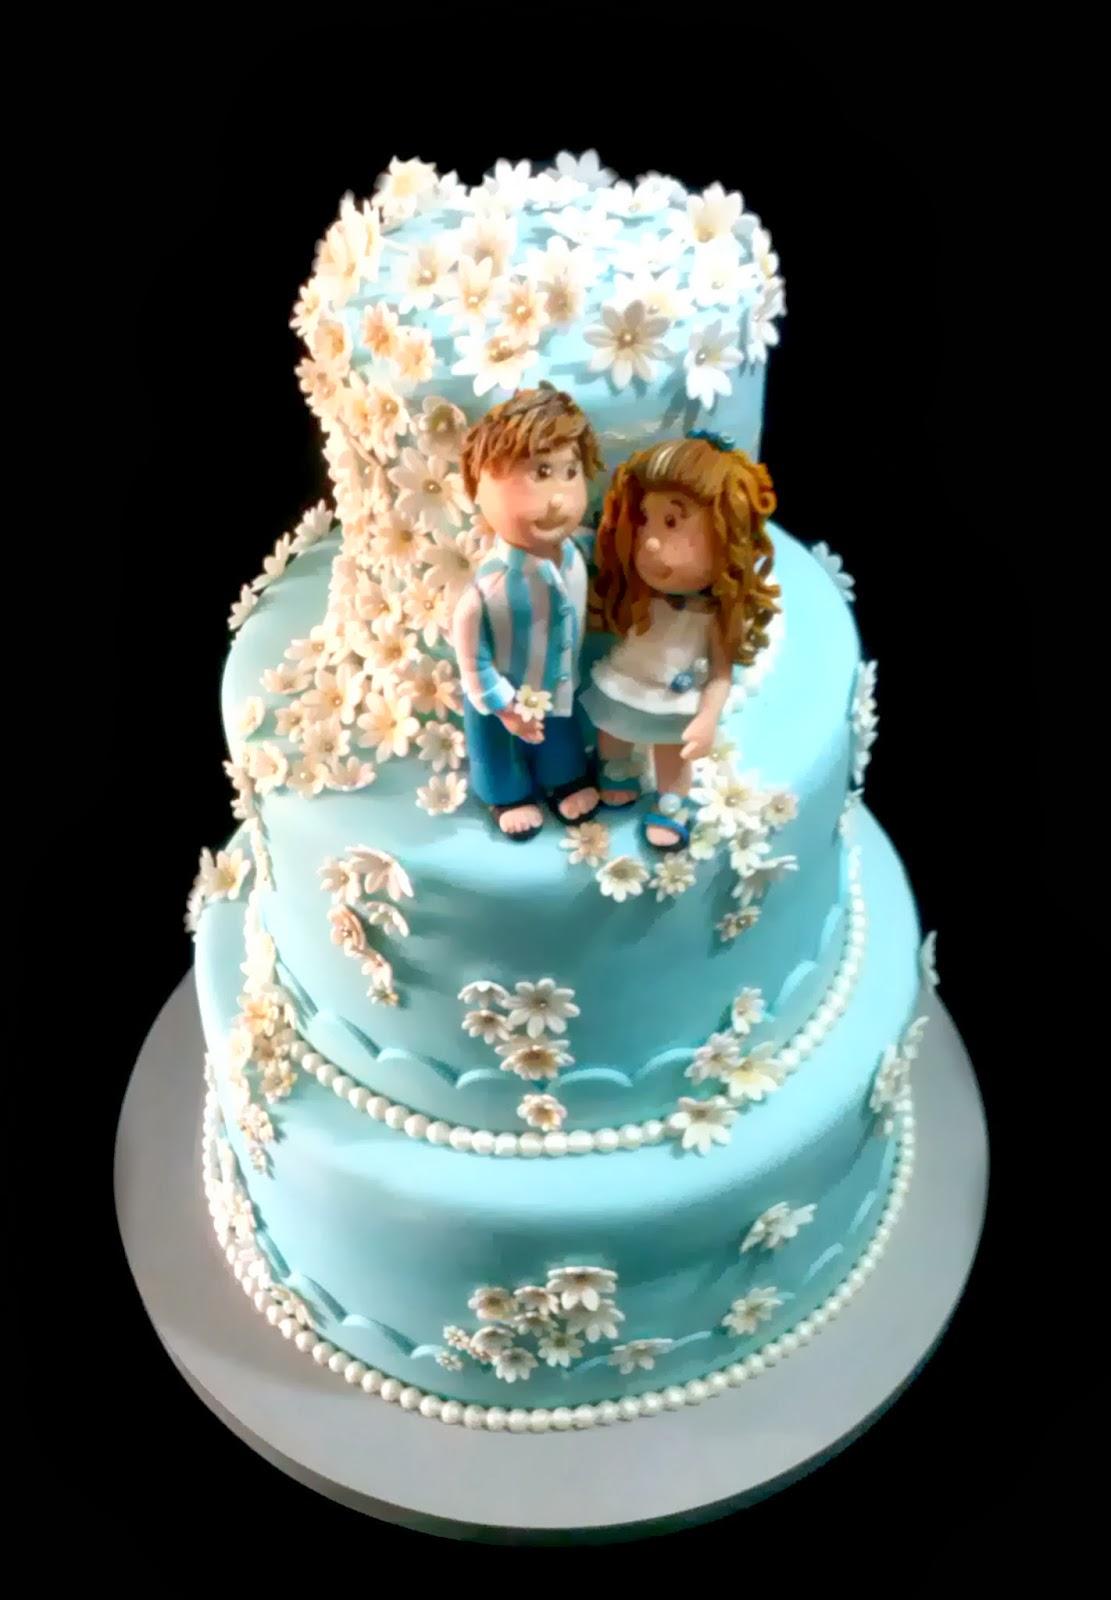 Ideas de la torta de boda en la playa